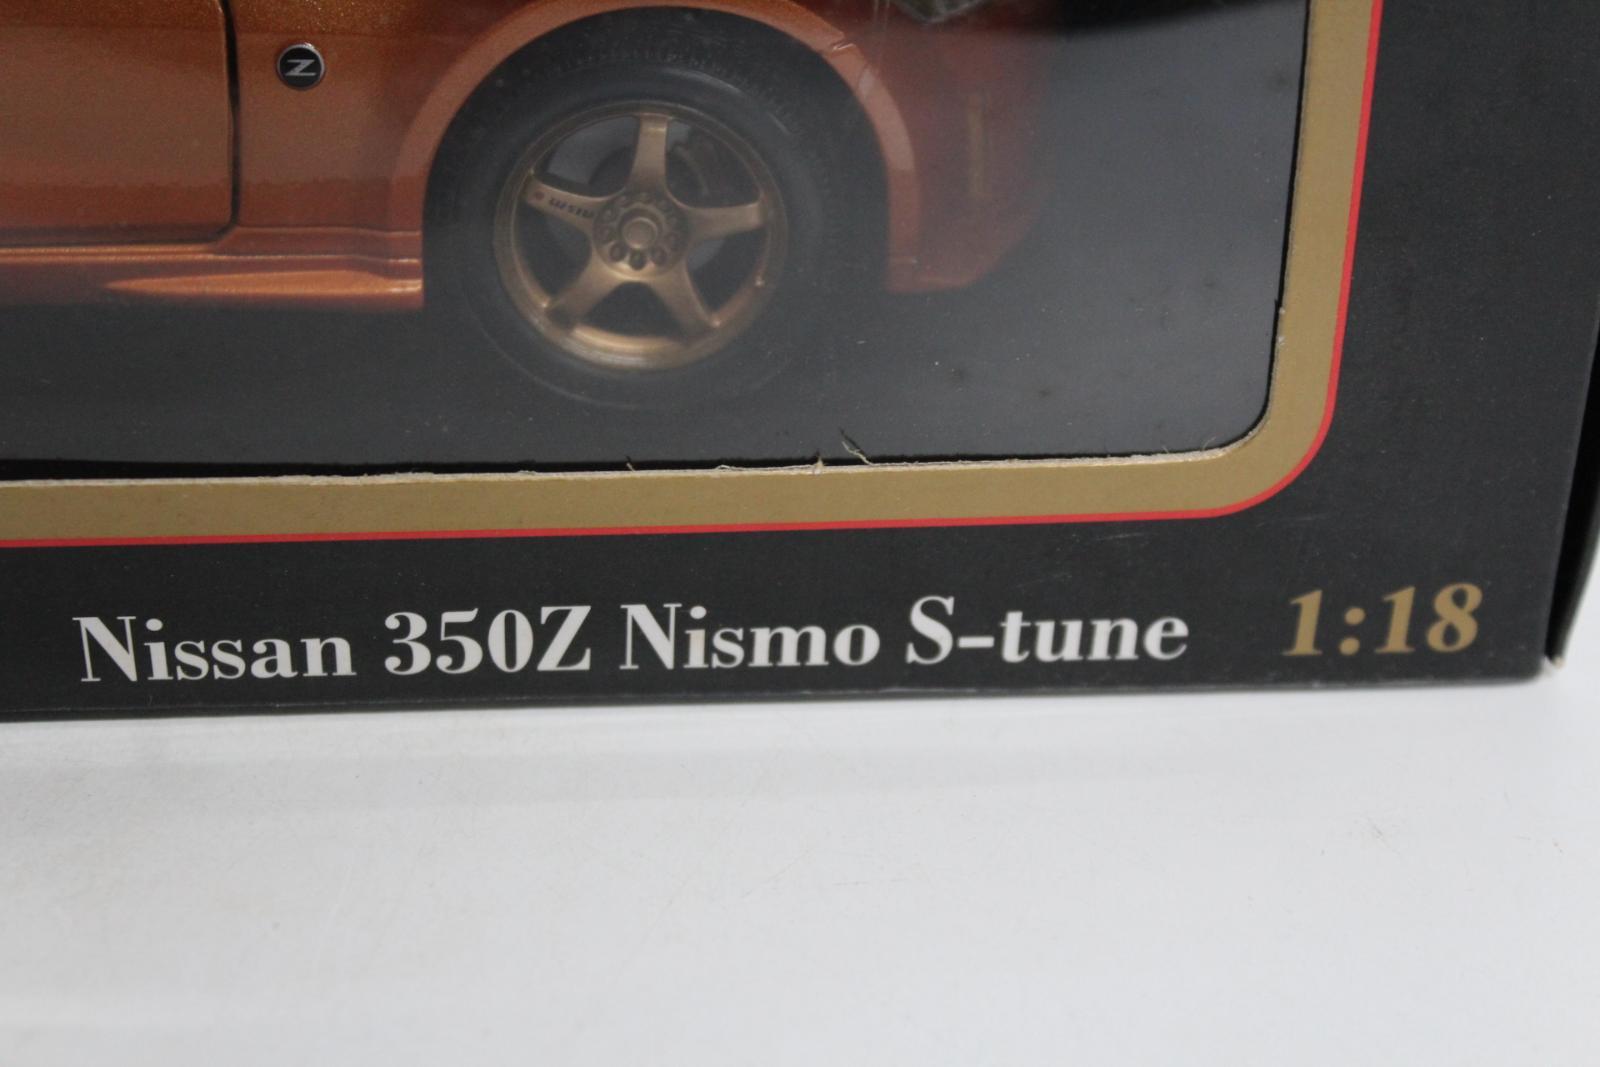 Maisto-31688-EDICIoN-Especial-Nissan-350z-Nismo-S-Tune-1-18-Escala-Modelo-de-Coche-Nuevo miniatura 5